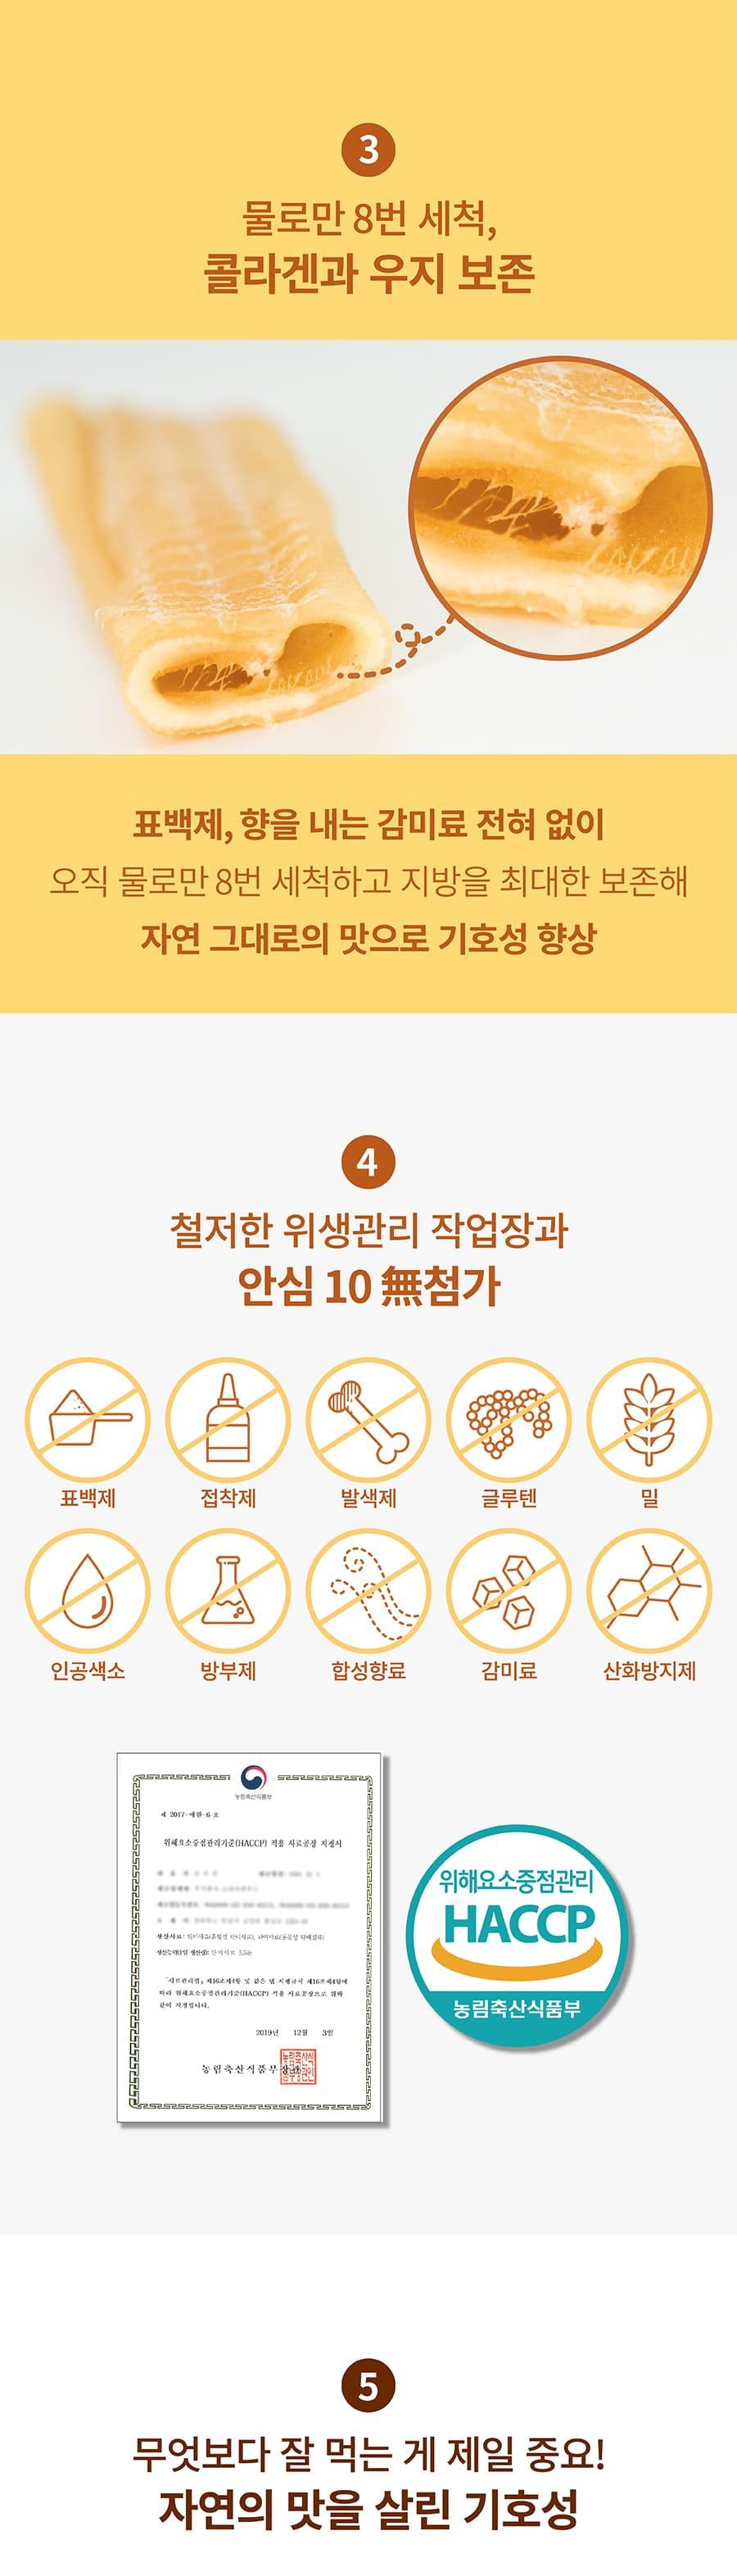 it 츄잇 만두 (닭/오리/칠면조)-상품이미지-29